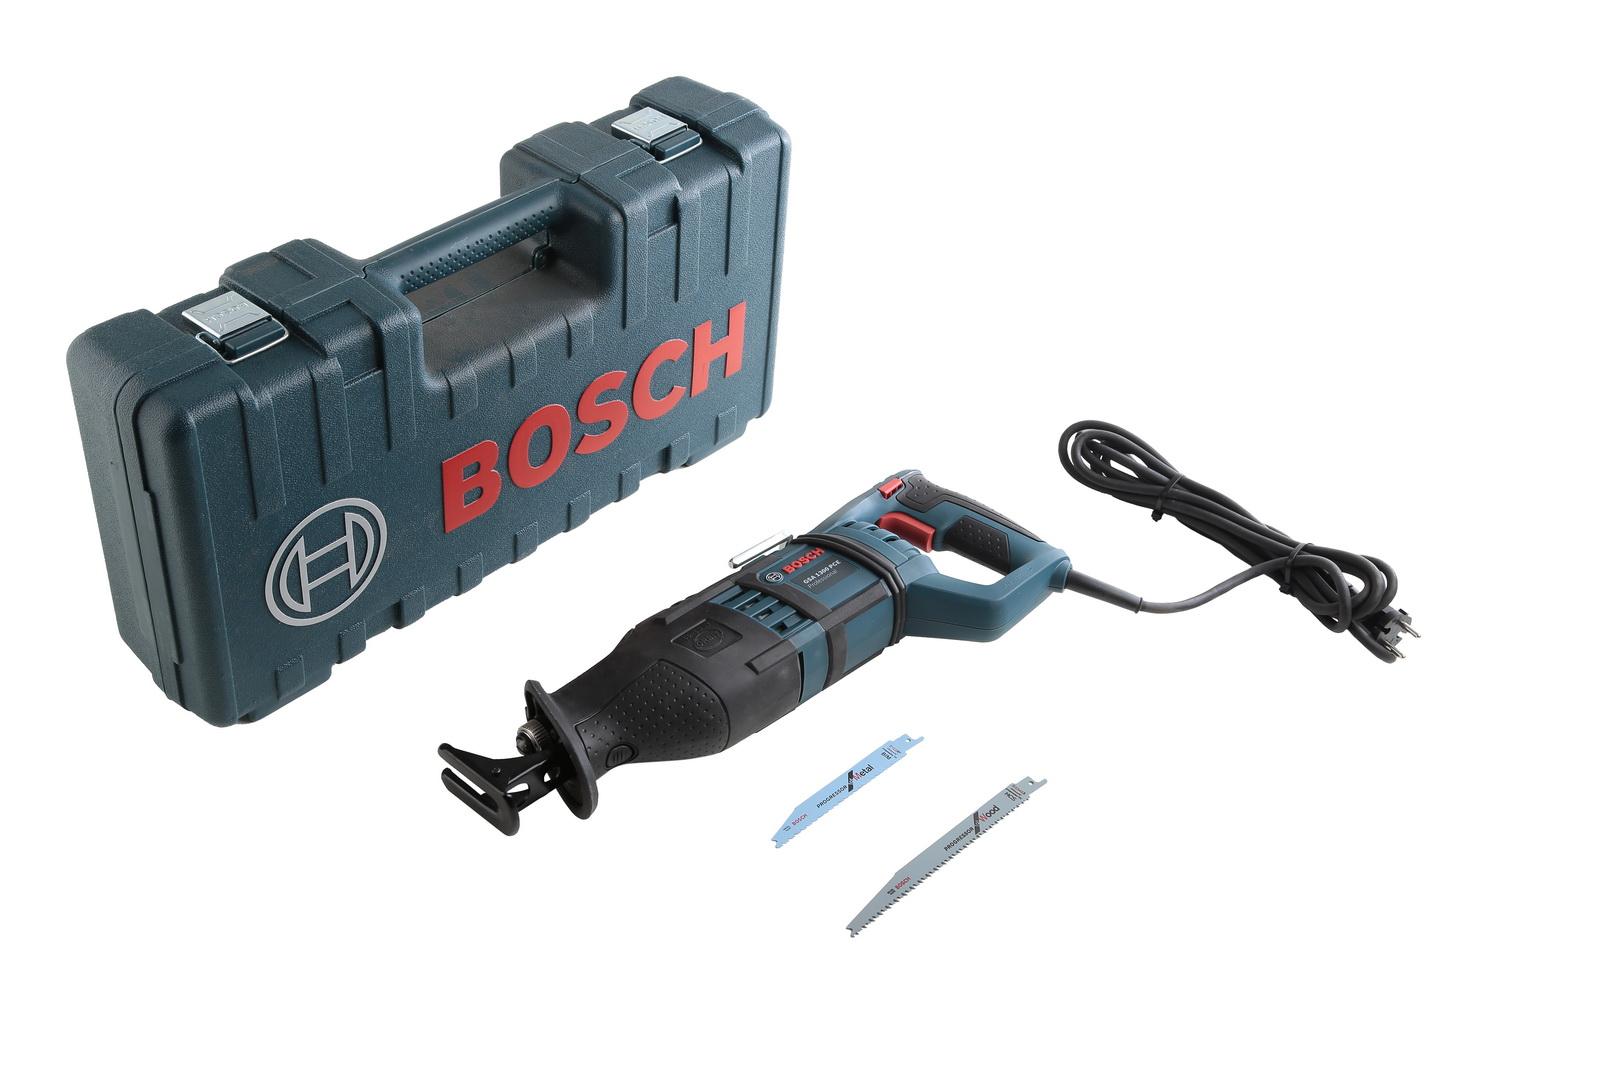 Сабельная пила Bosch Gsa 1300 pce (0.601.64e.200)